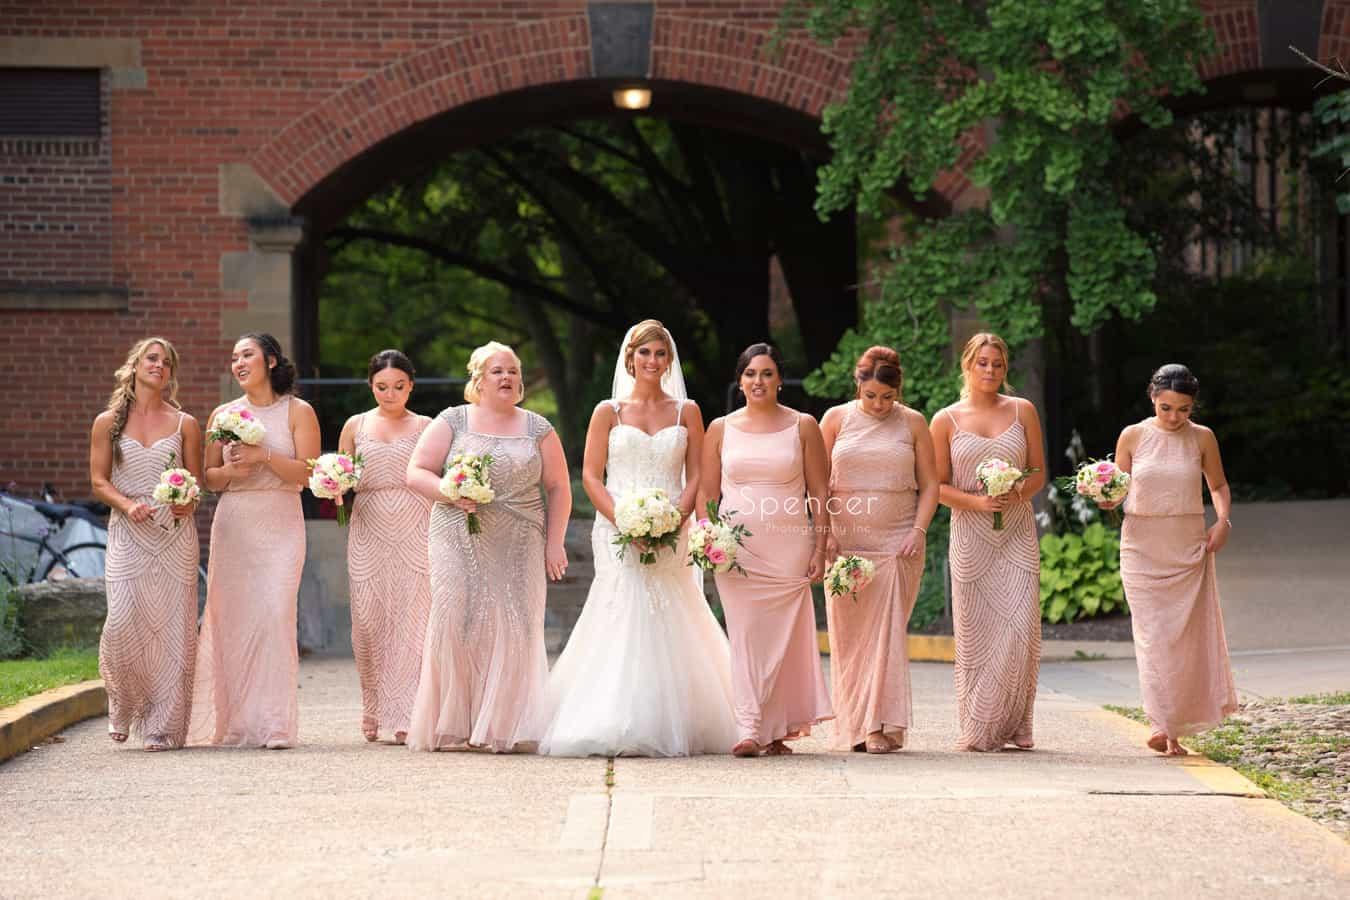 bridesmaids after wedding ceremony at St. Vincent